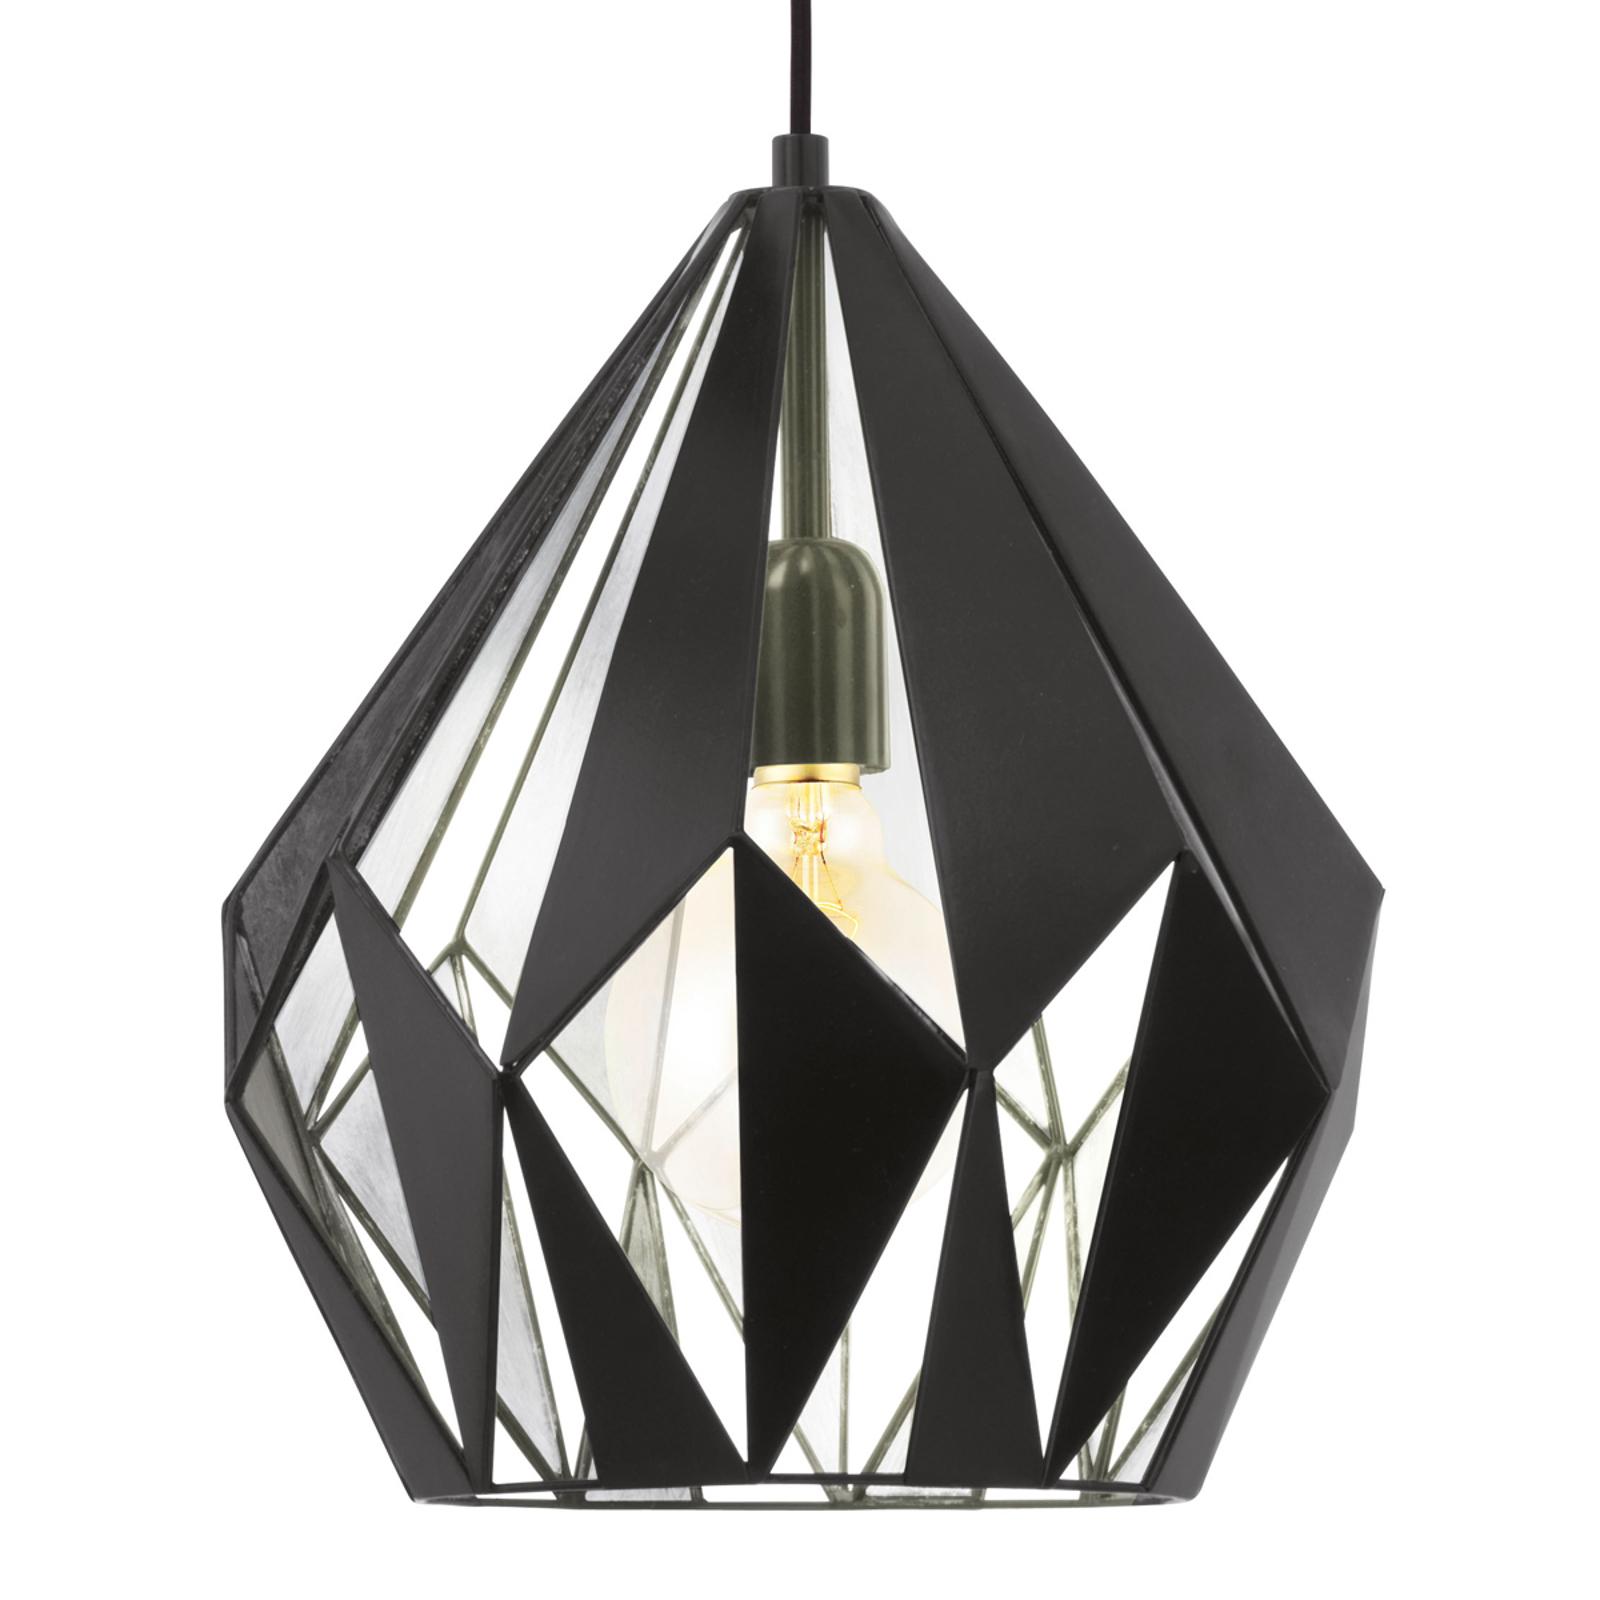 Lampada a sospensione color nero-argento Carlton